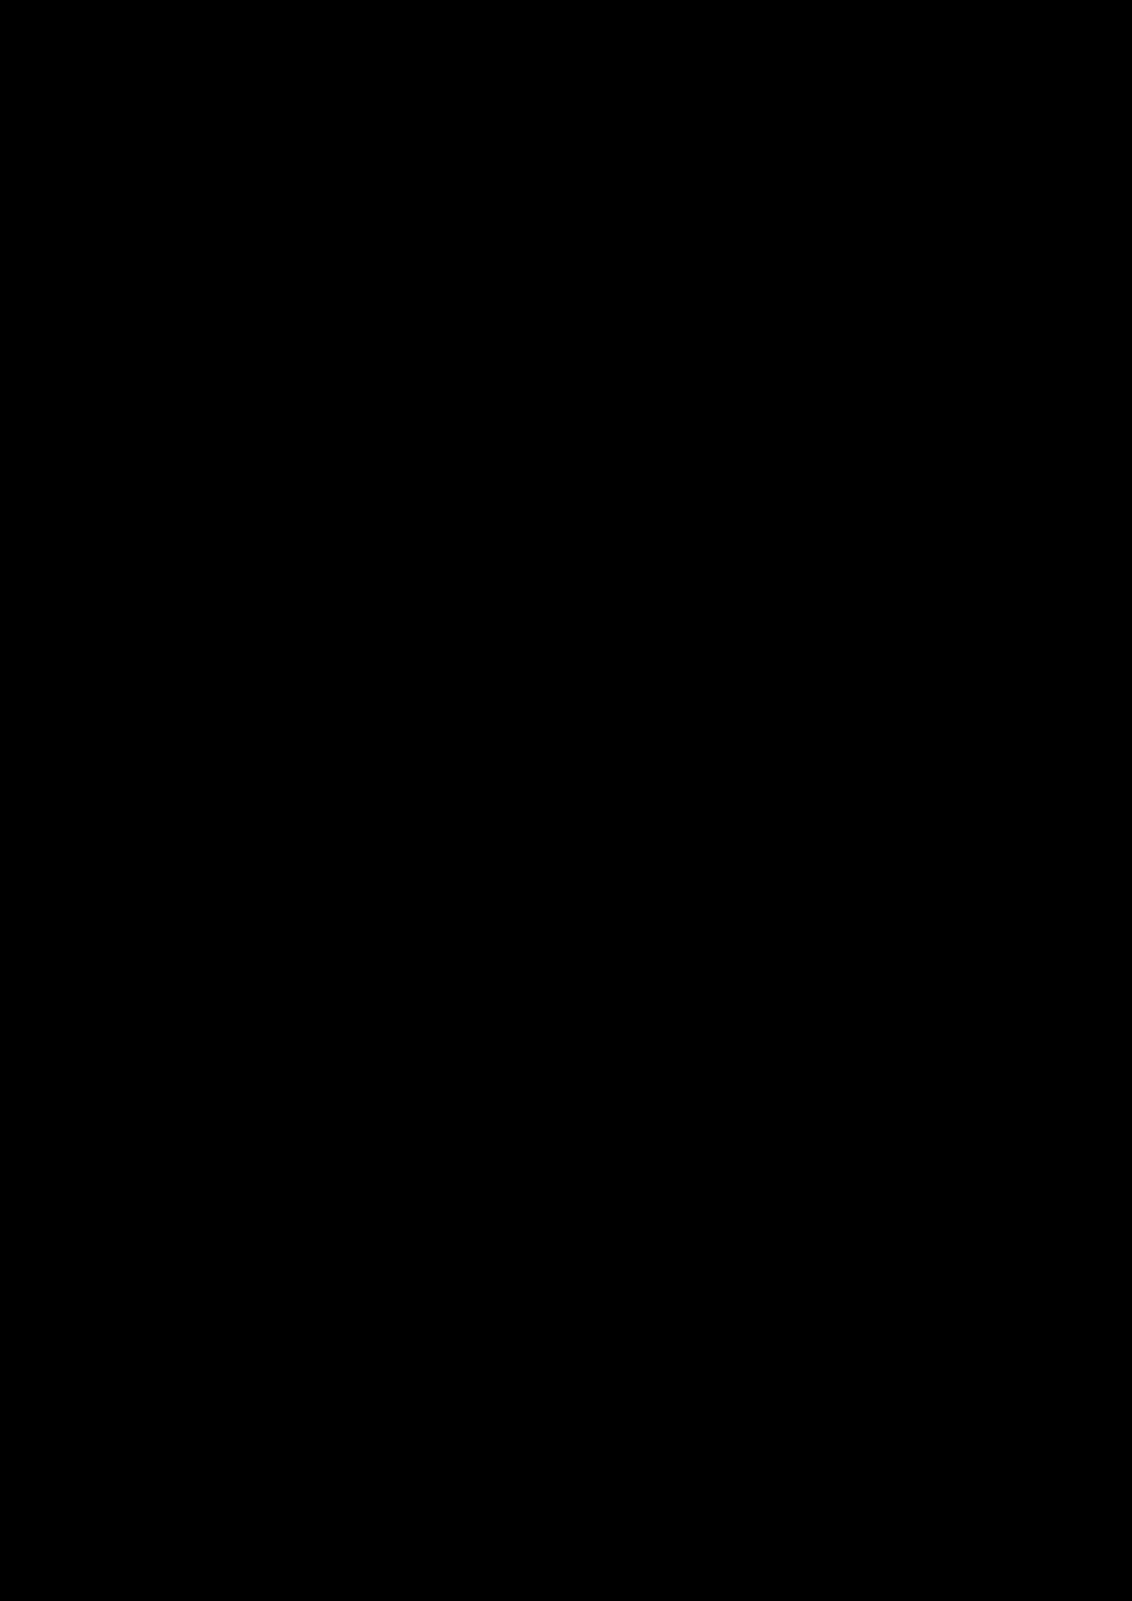 Belyiy sokol slide, Image 101